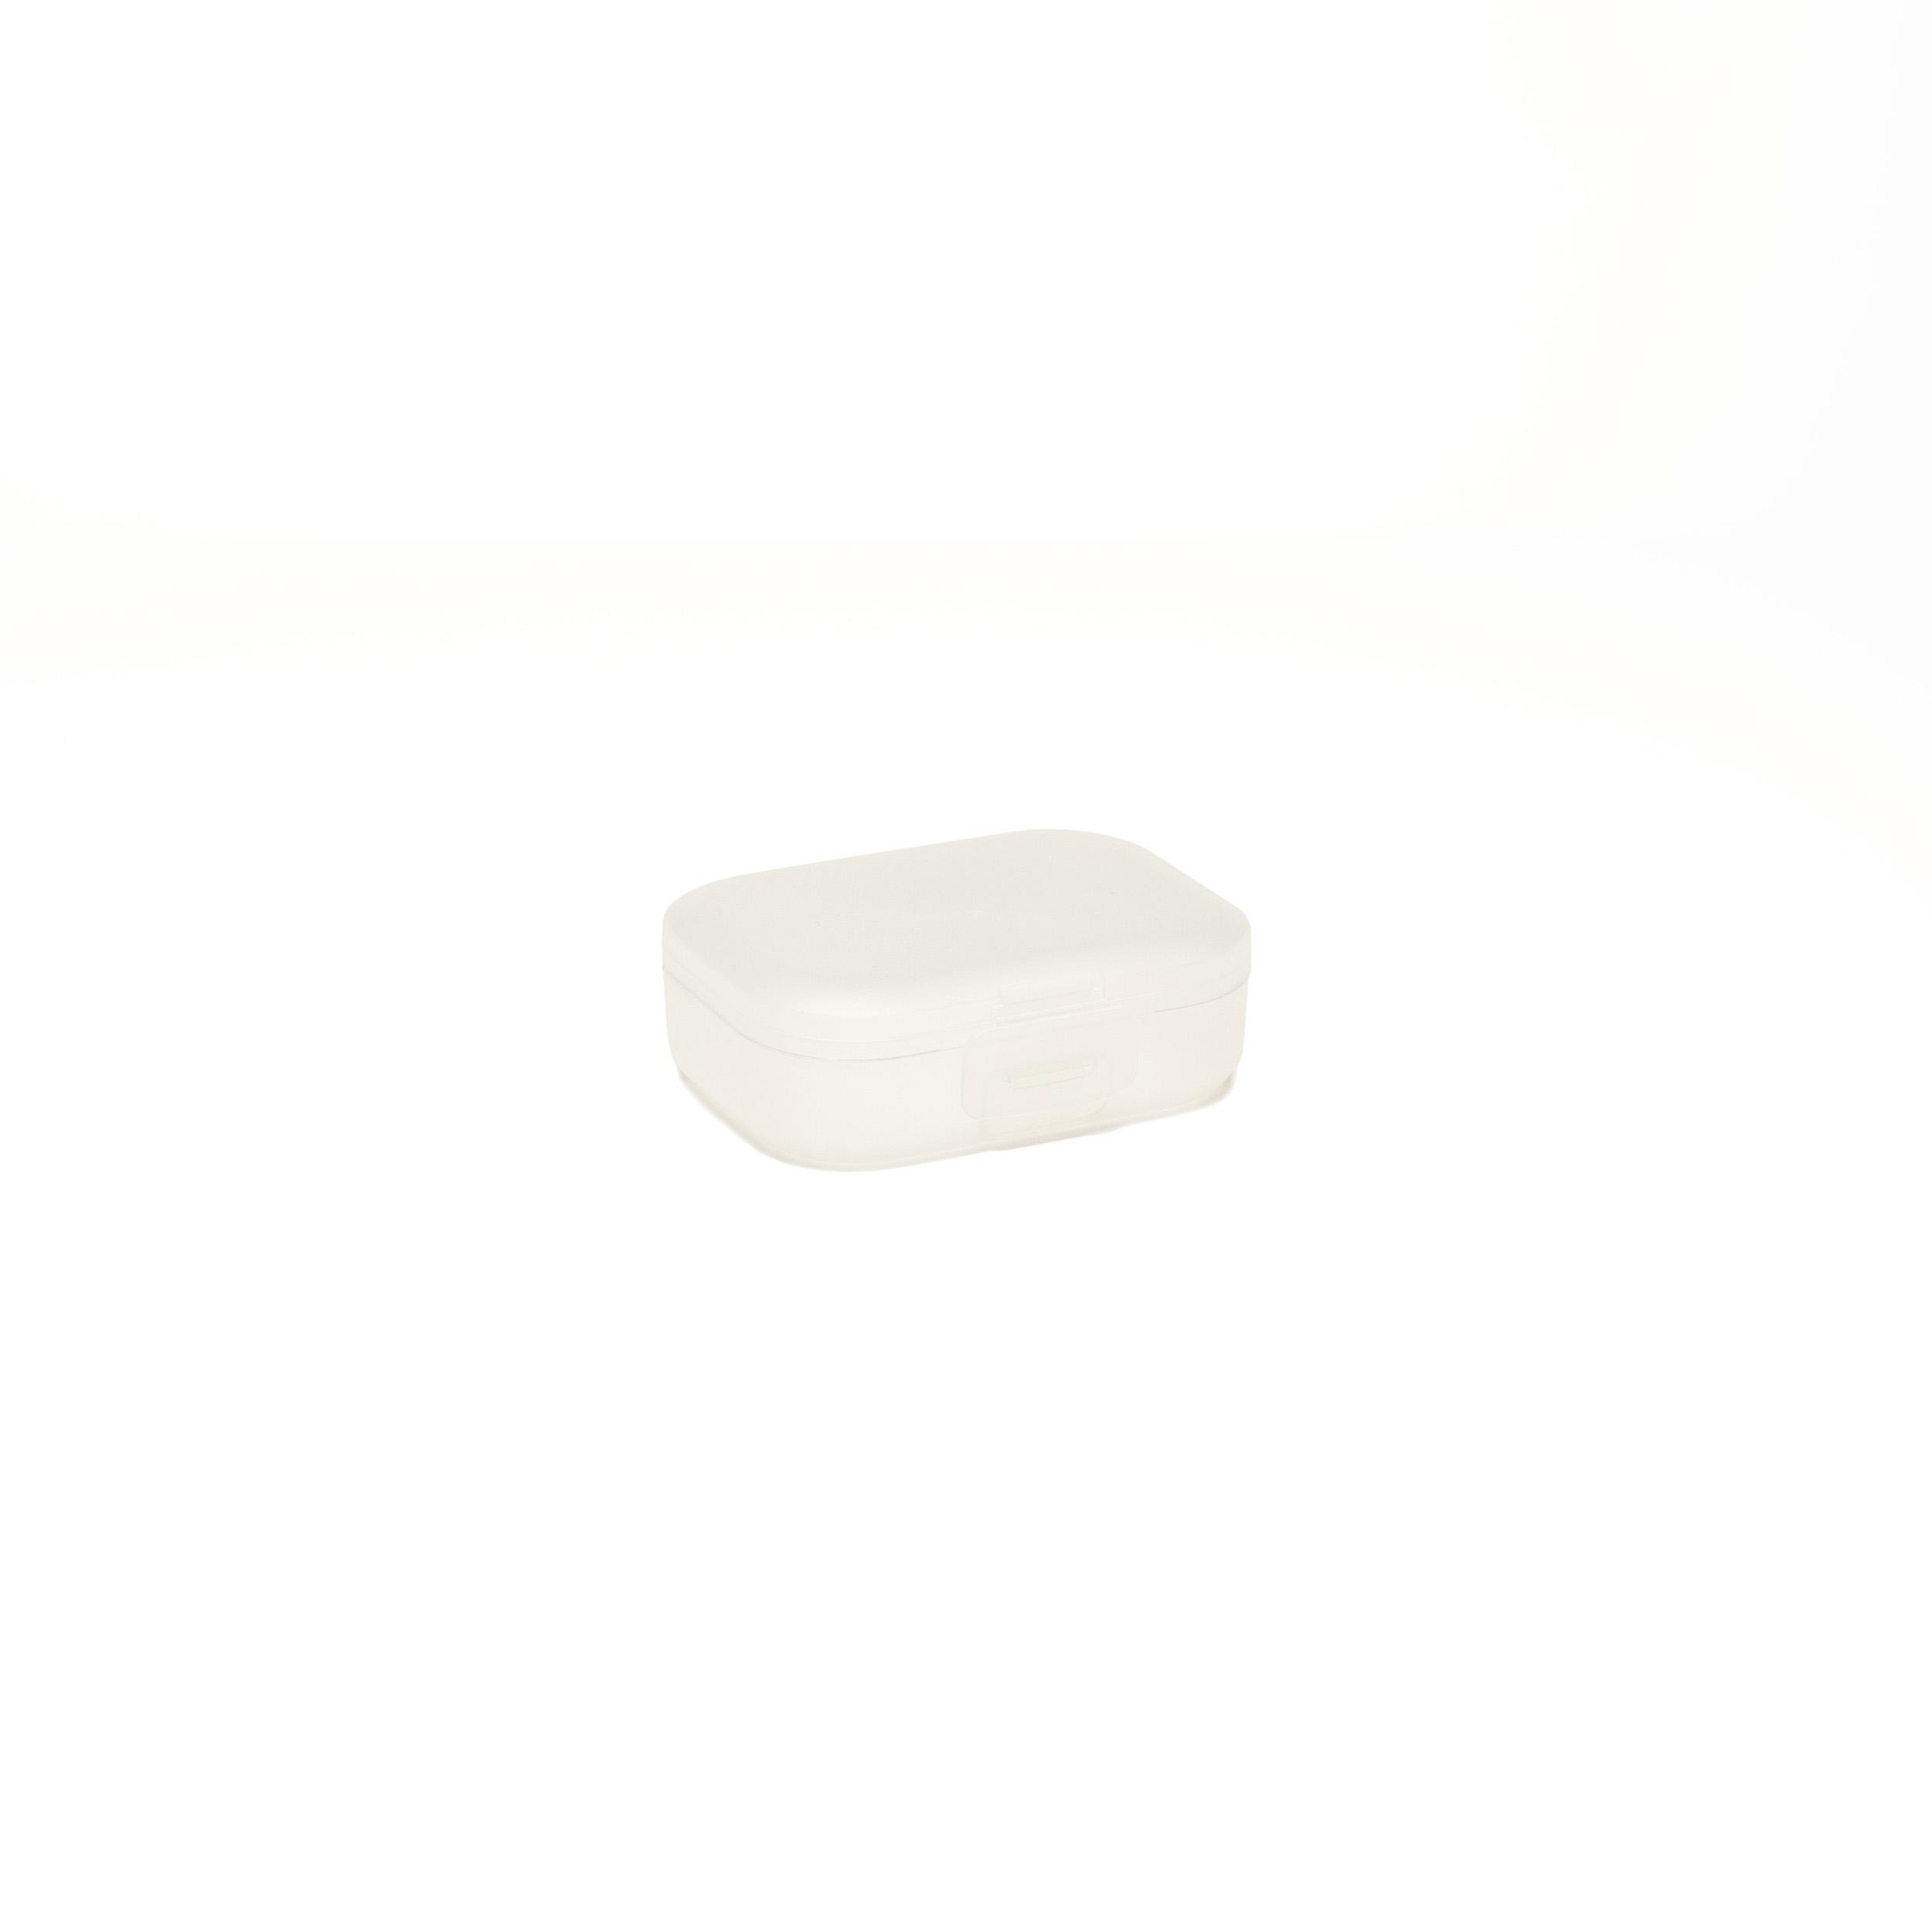 Transparant A-000143